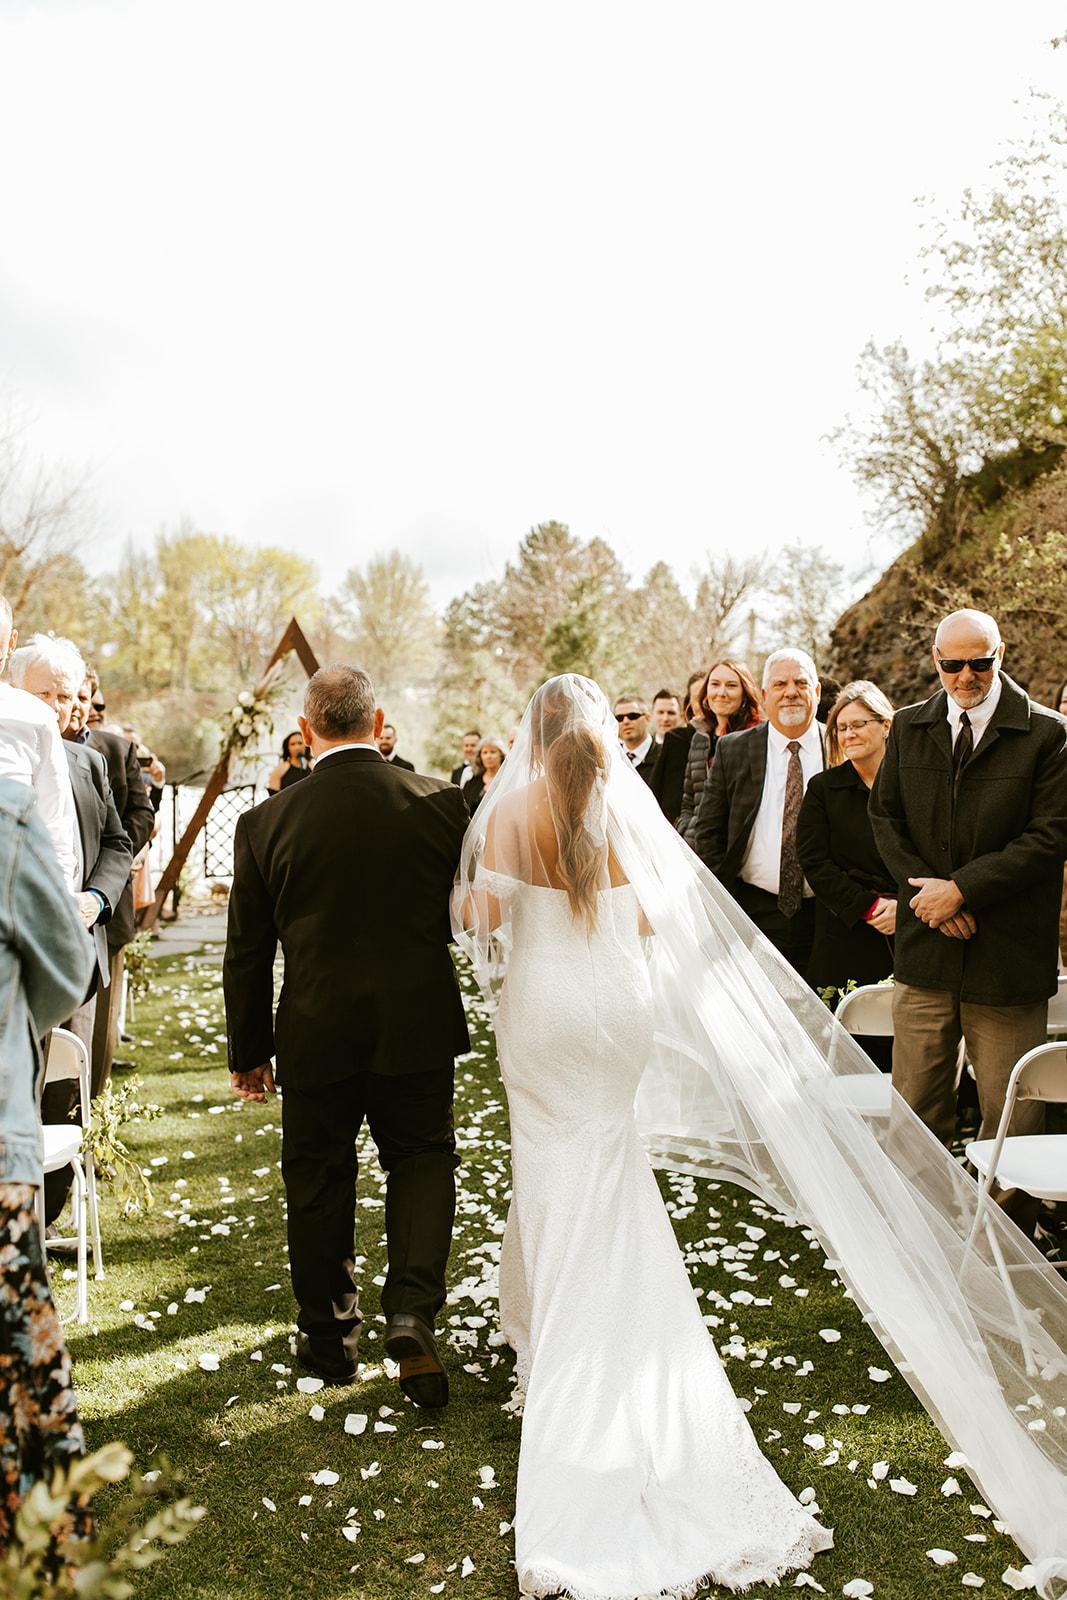 Chateau Rive Spokane Wedding Spokane Blog Dress aisle